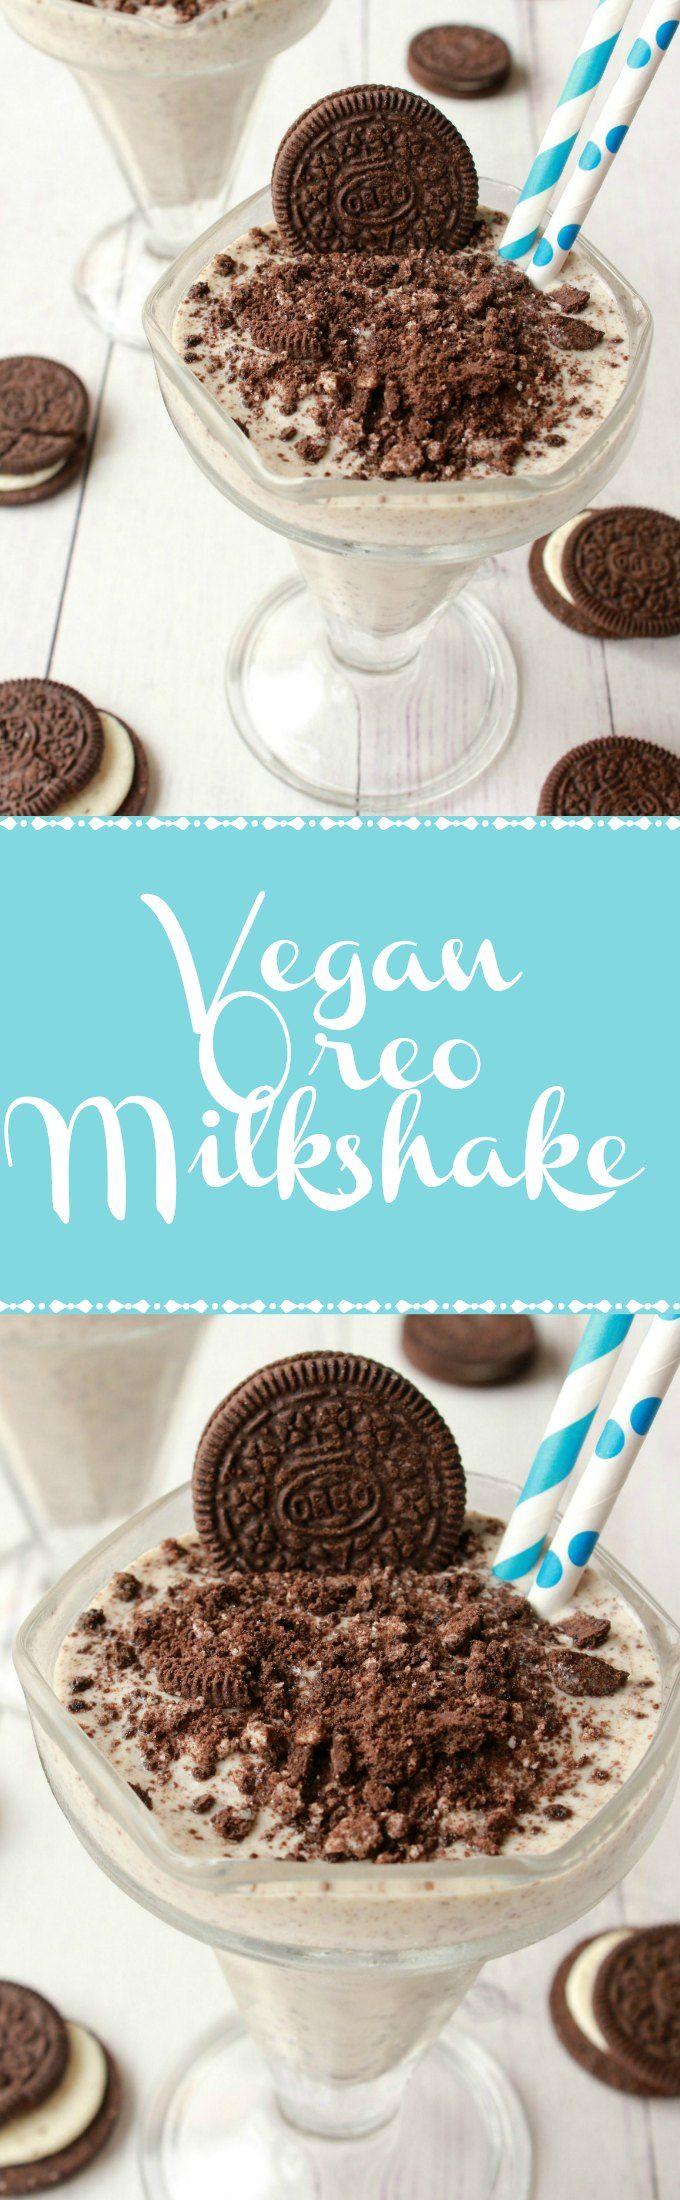 Super Easy 3-Ingredient Vegan Oreo Milkshake. Ready in 5 minutes! Vegan | Vegan Dessert | Vegan Milkshake | Vegan Food | Vegan Recipes